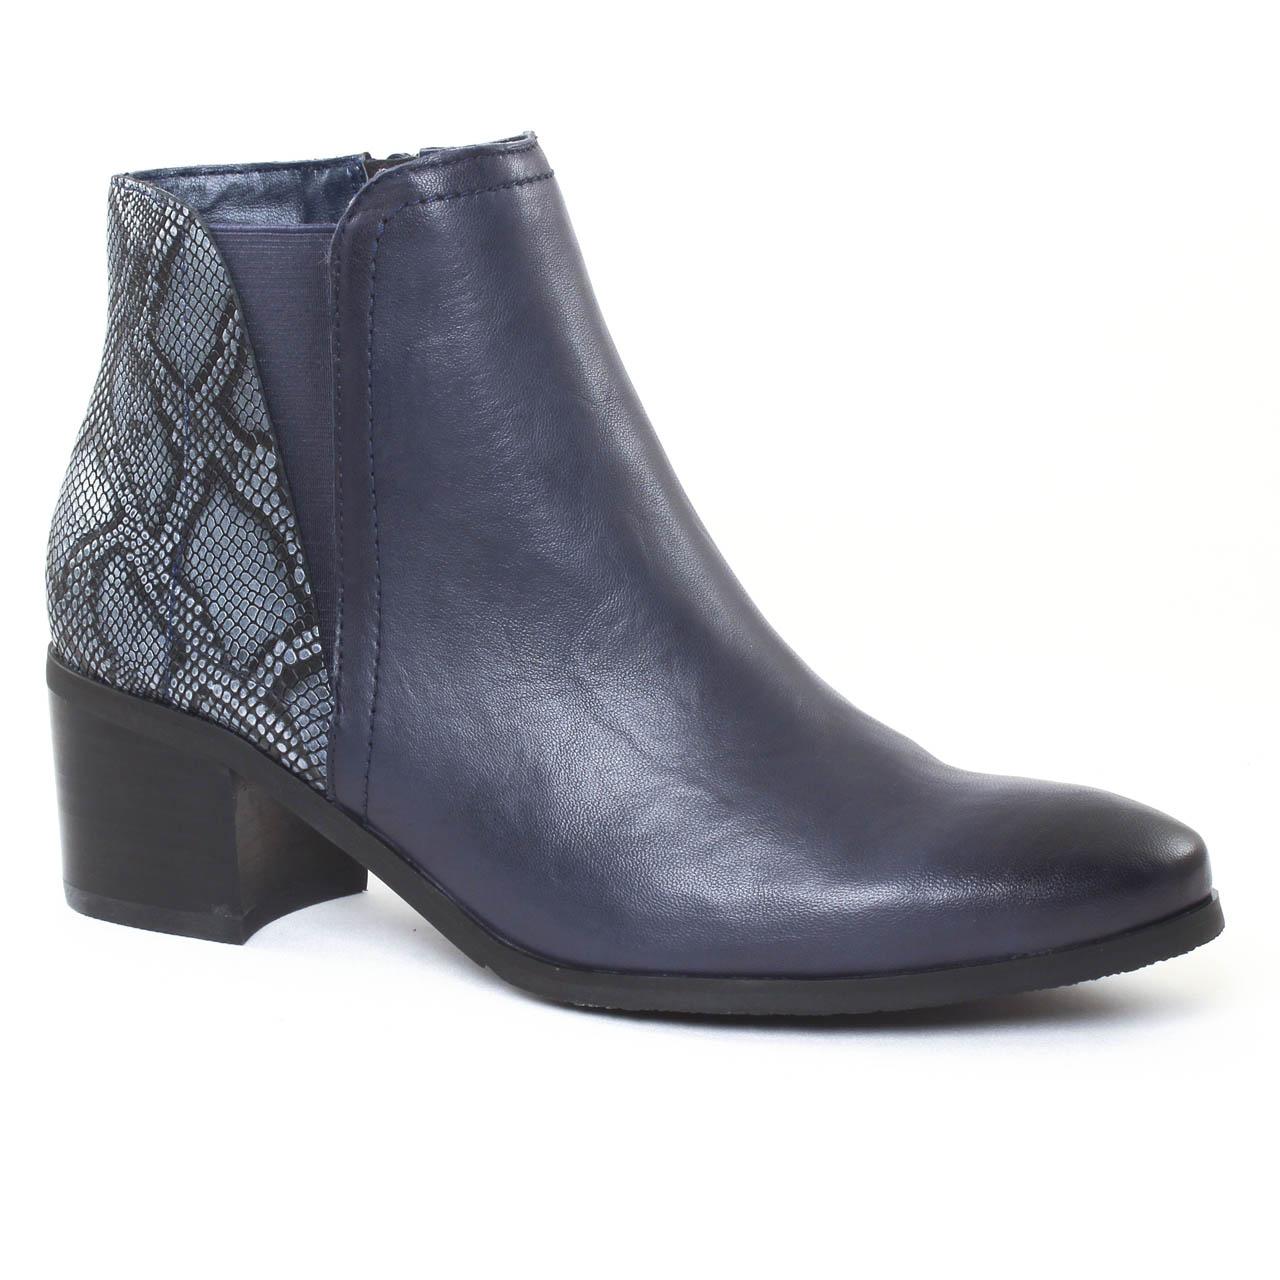 chaussures femmes automne hiver boots talon bleu marine car interior design. Black Bedroom Furniture Sets. Home Design Ideas